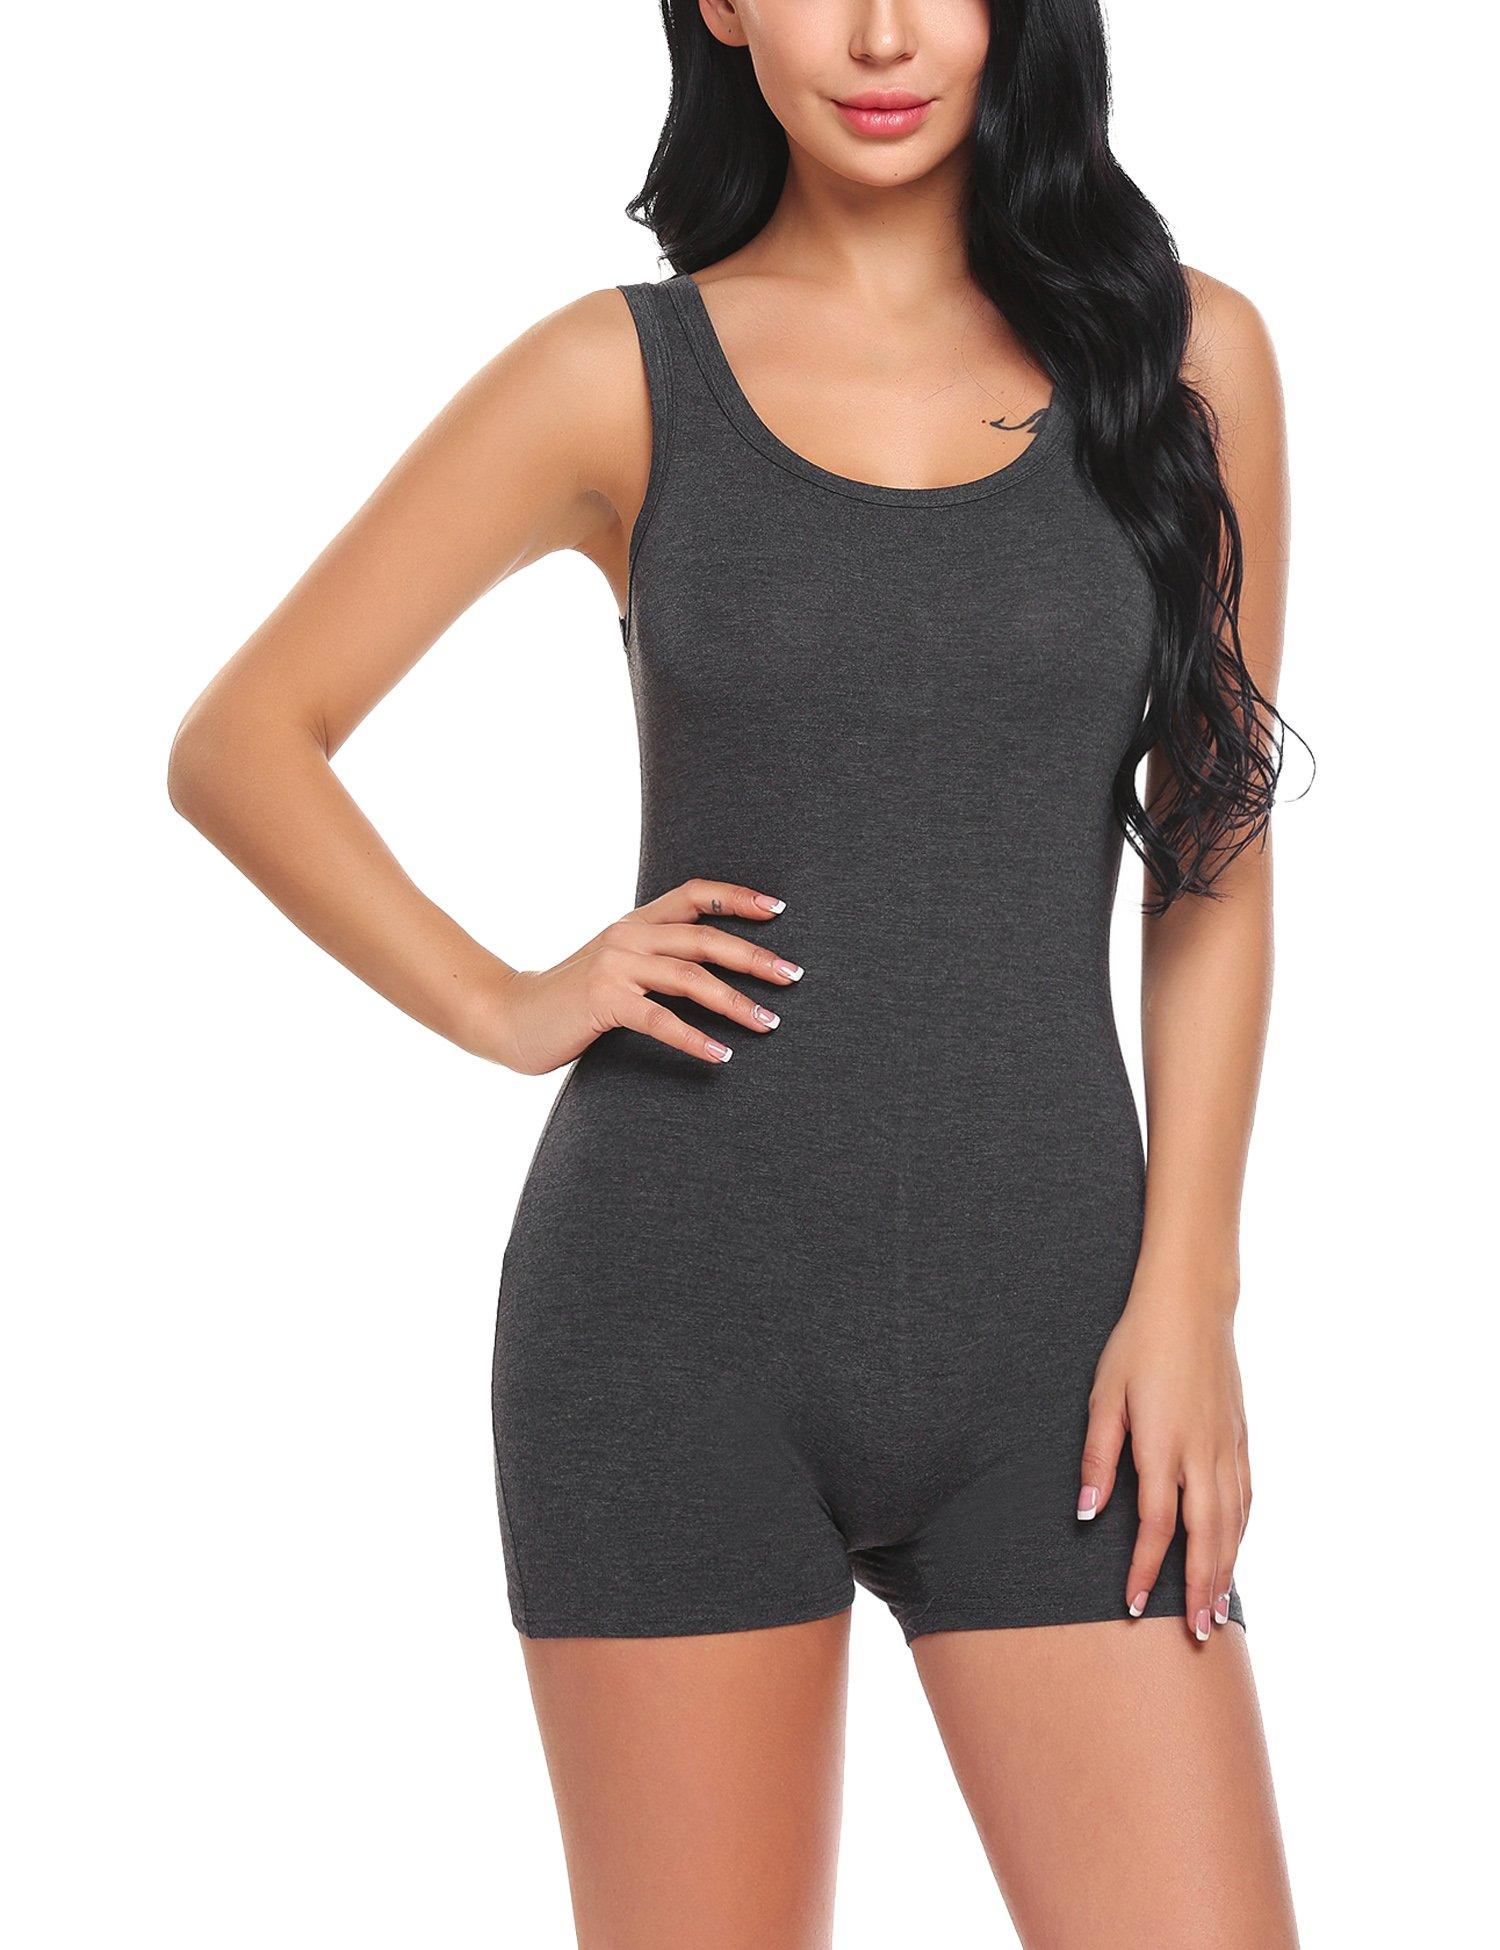 Ekouaer Women\'s Bodysuits Sexy Cotton Scoop-Neck Jumpsuits Sleeveless Tank Leotard